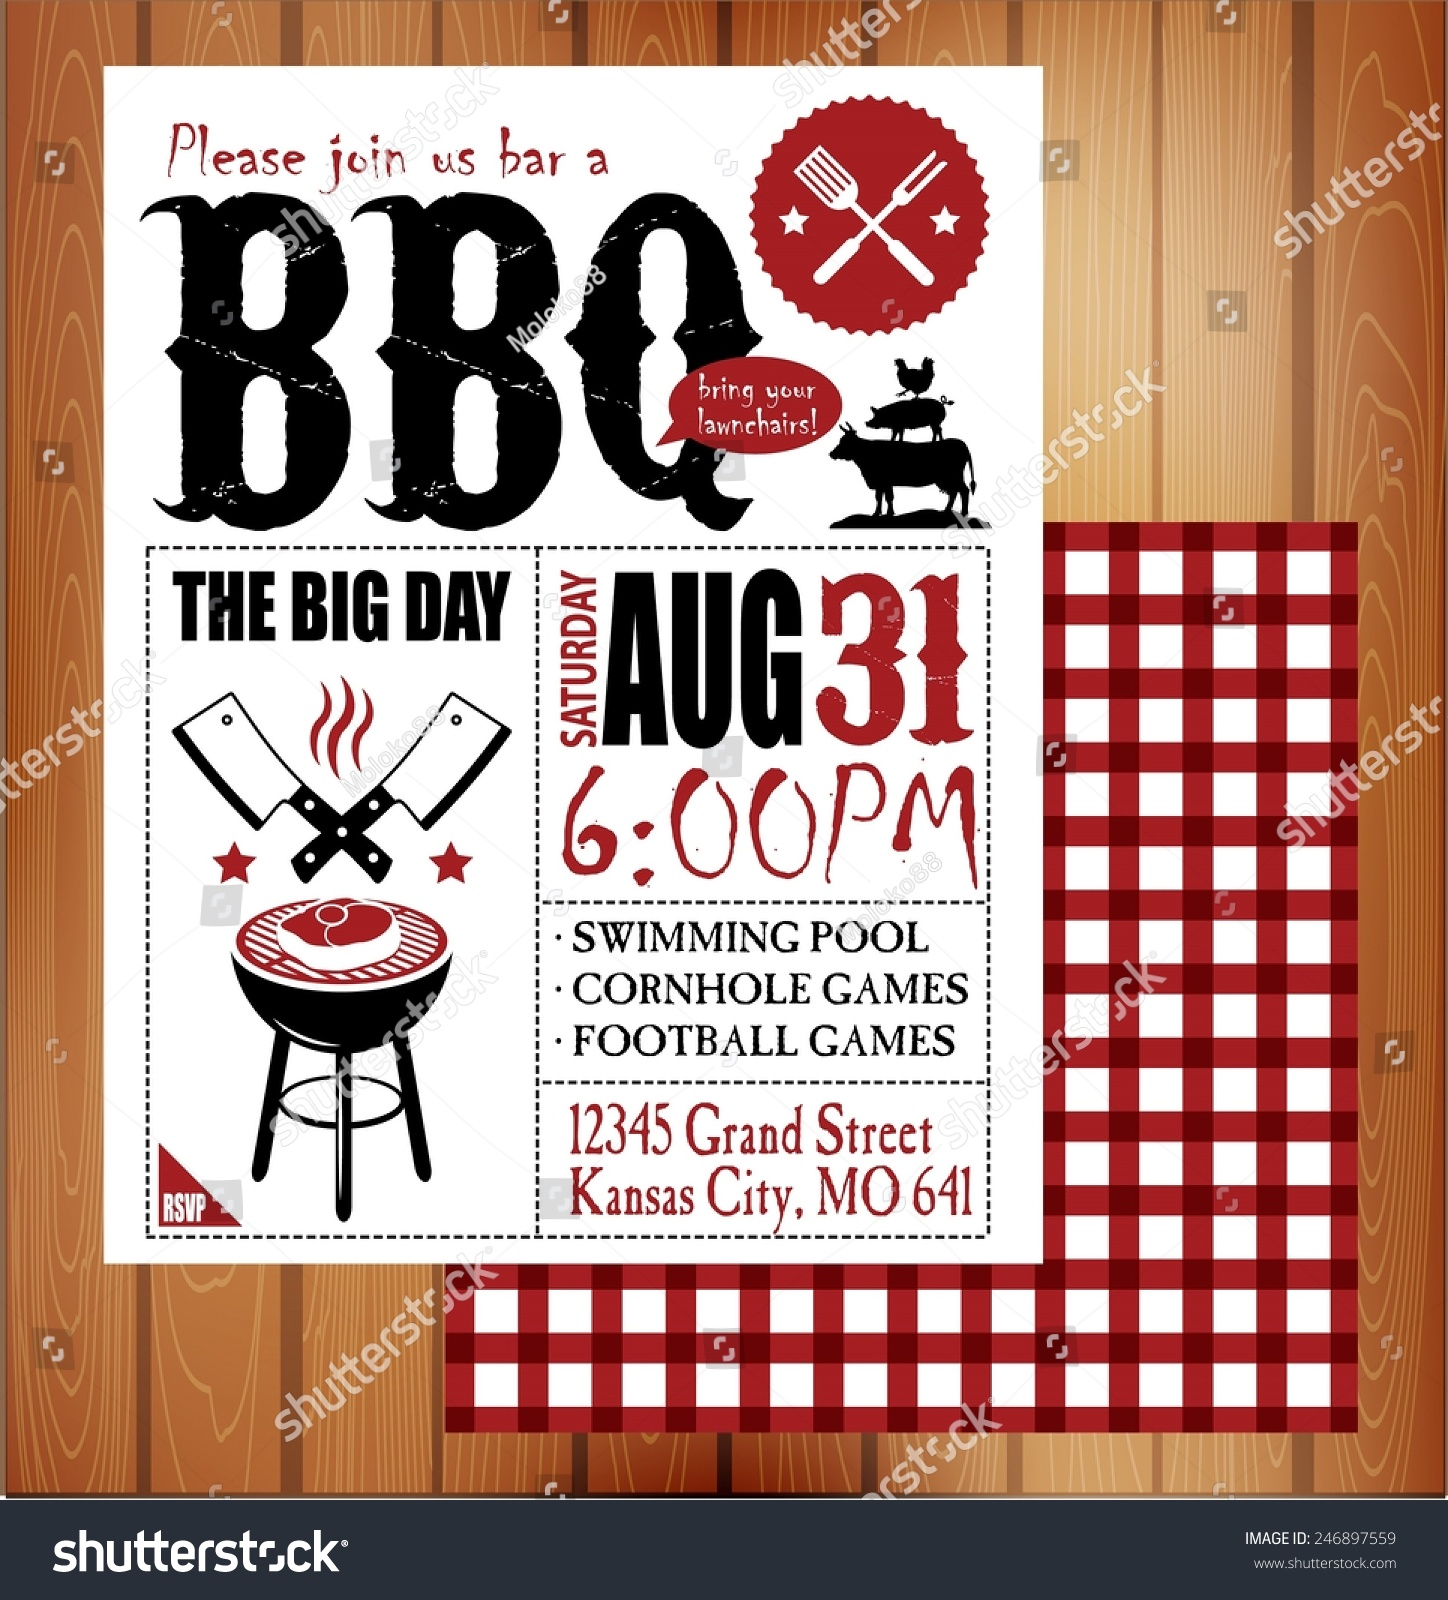 Vintage Barbecue Invitation Card Stock Vector (Royalty Free ...